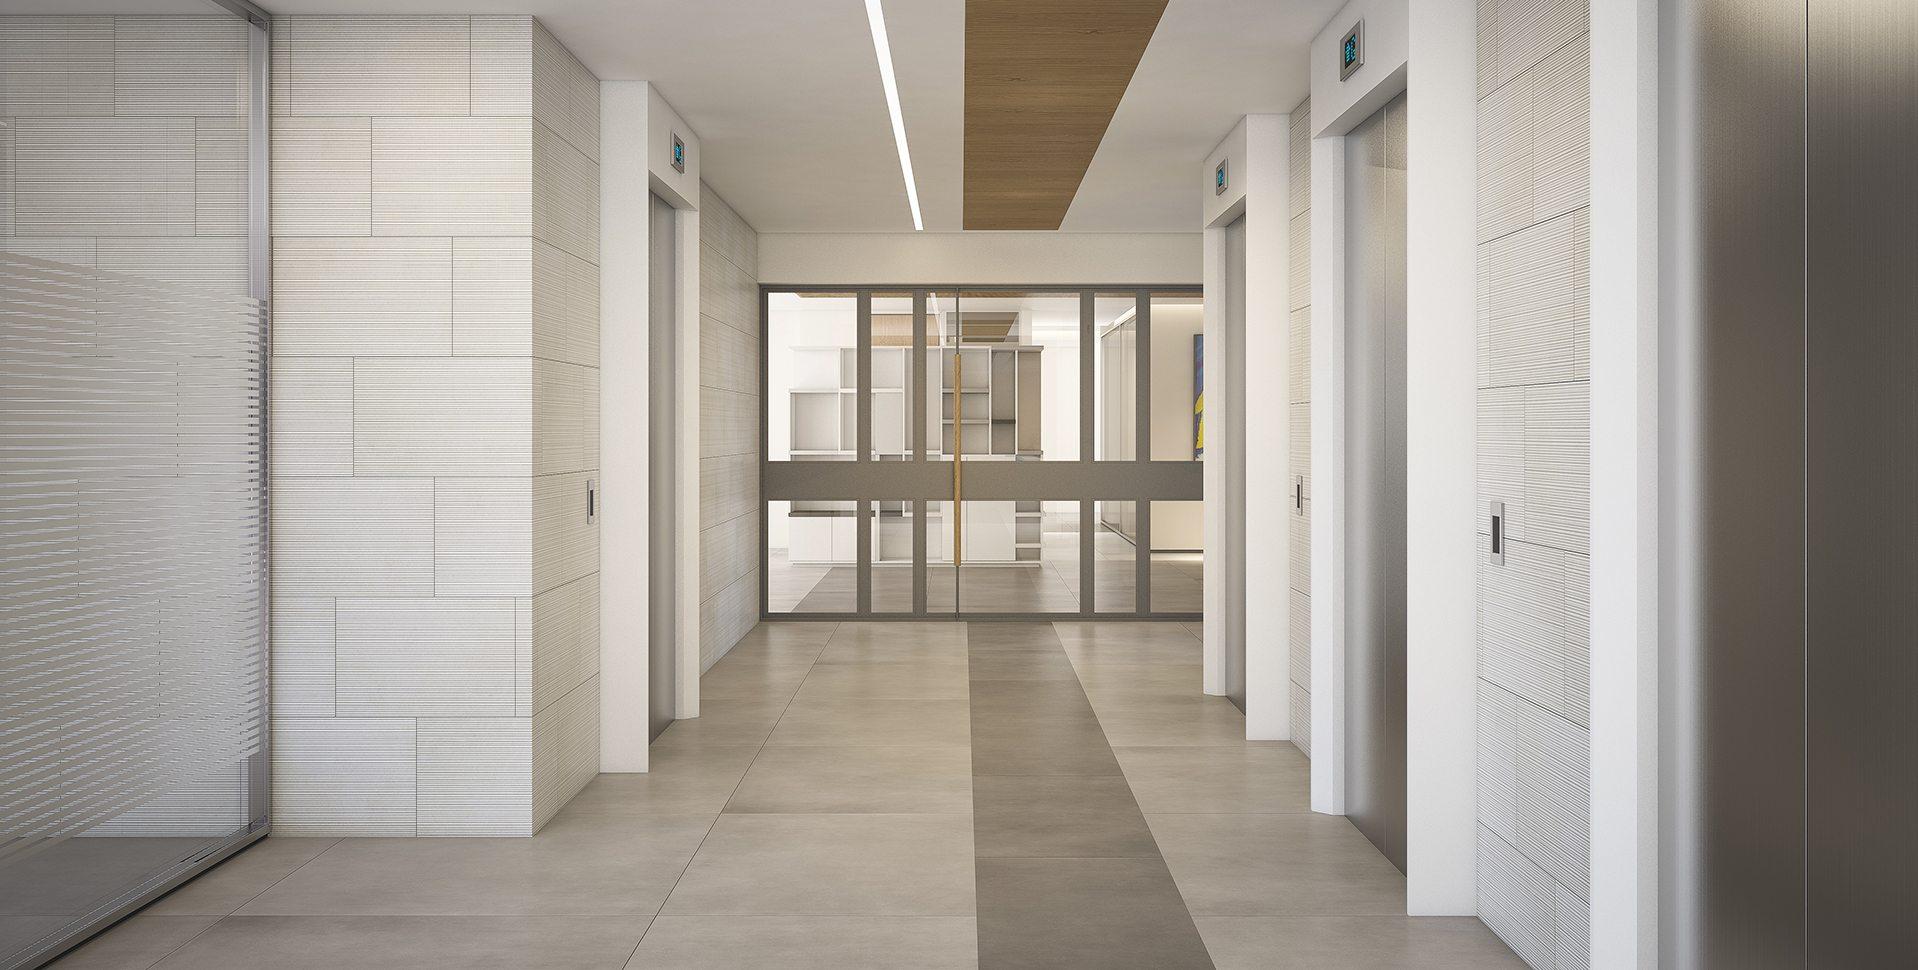 Architectural Visualization: BDSK Hallway by Dunsky Architects